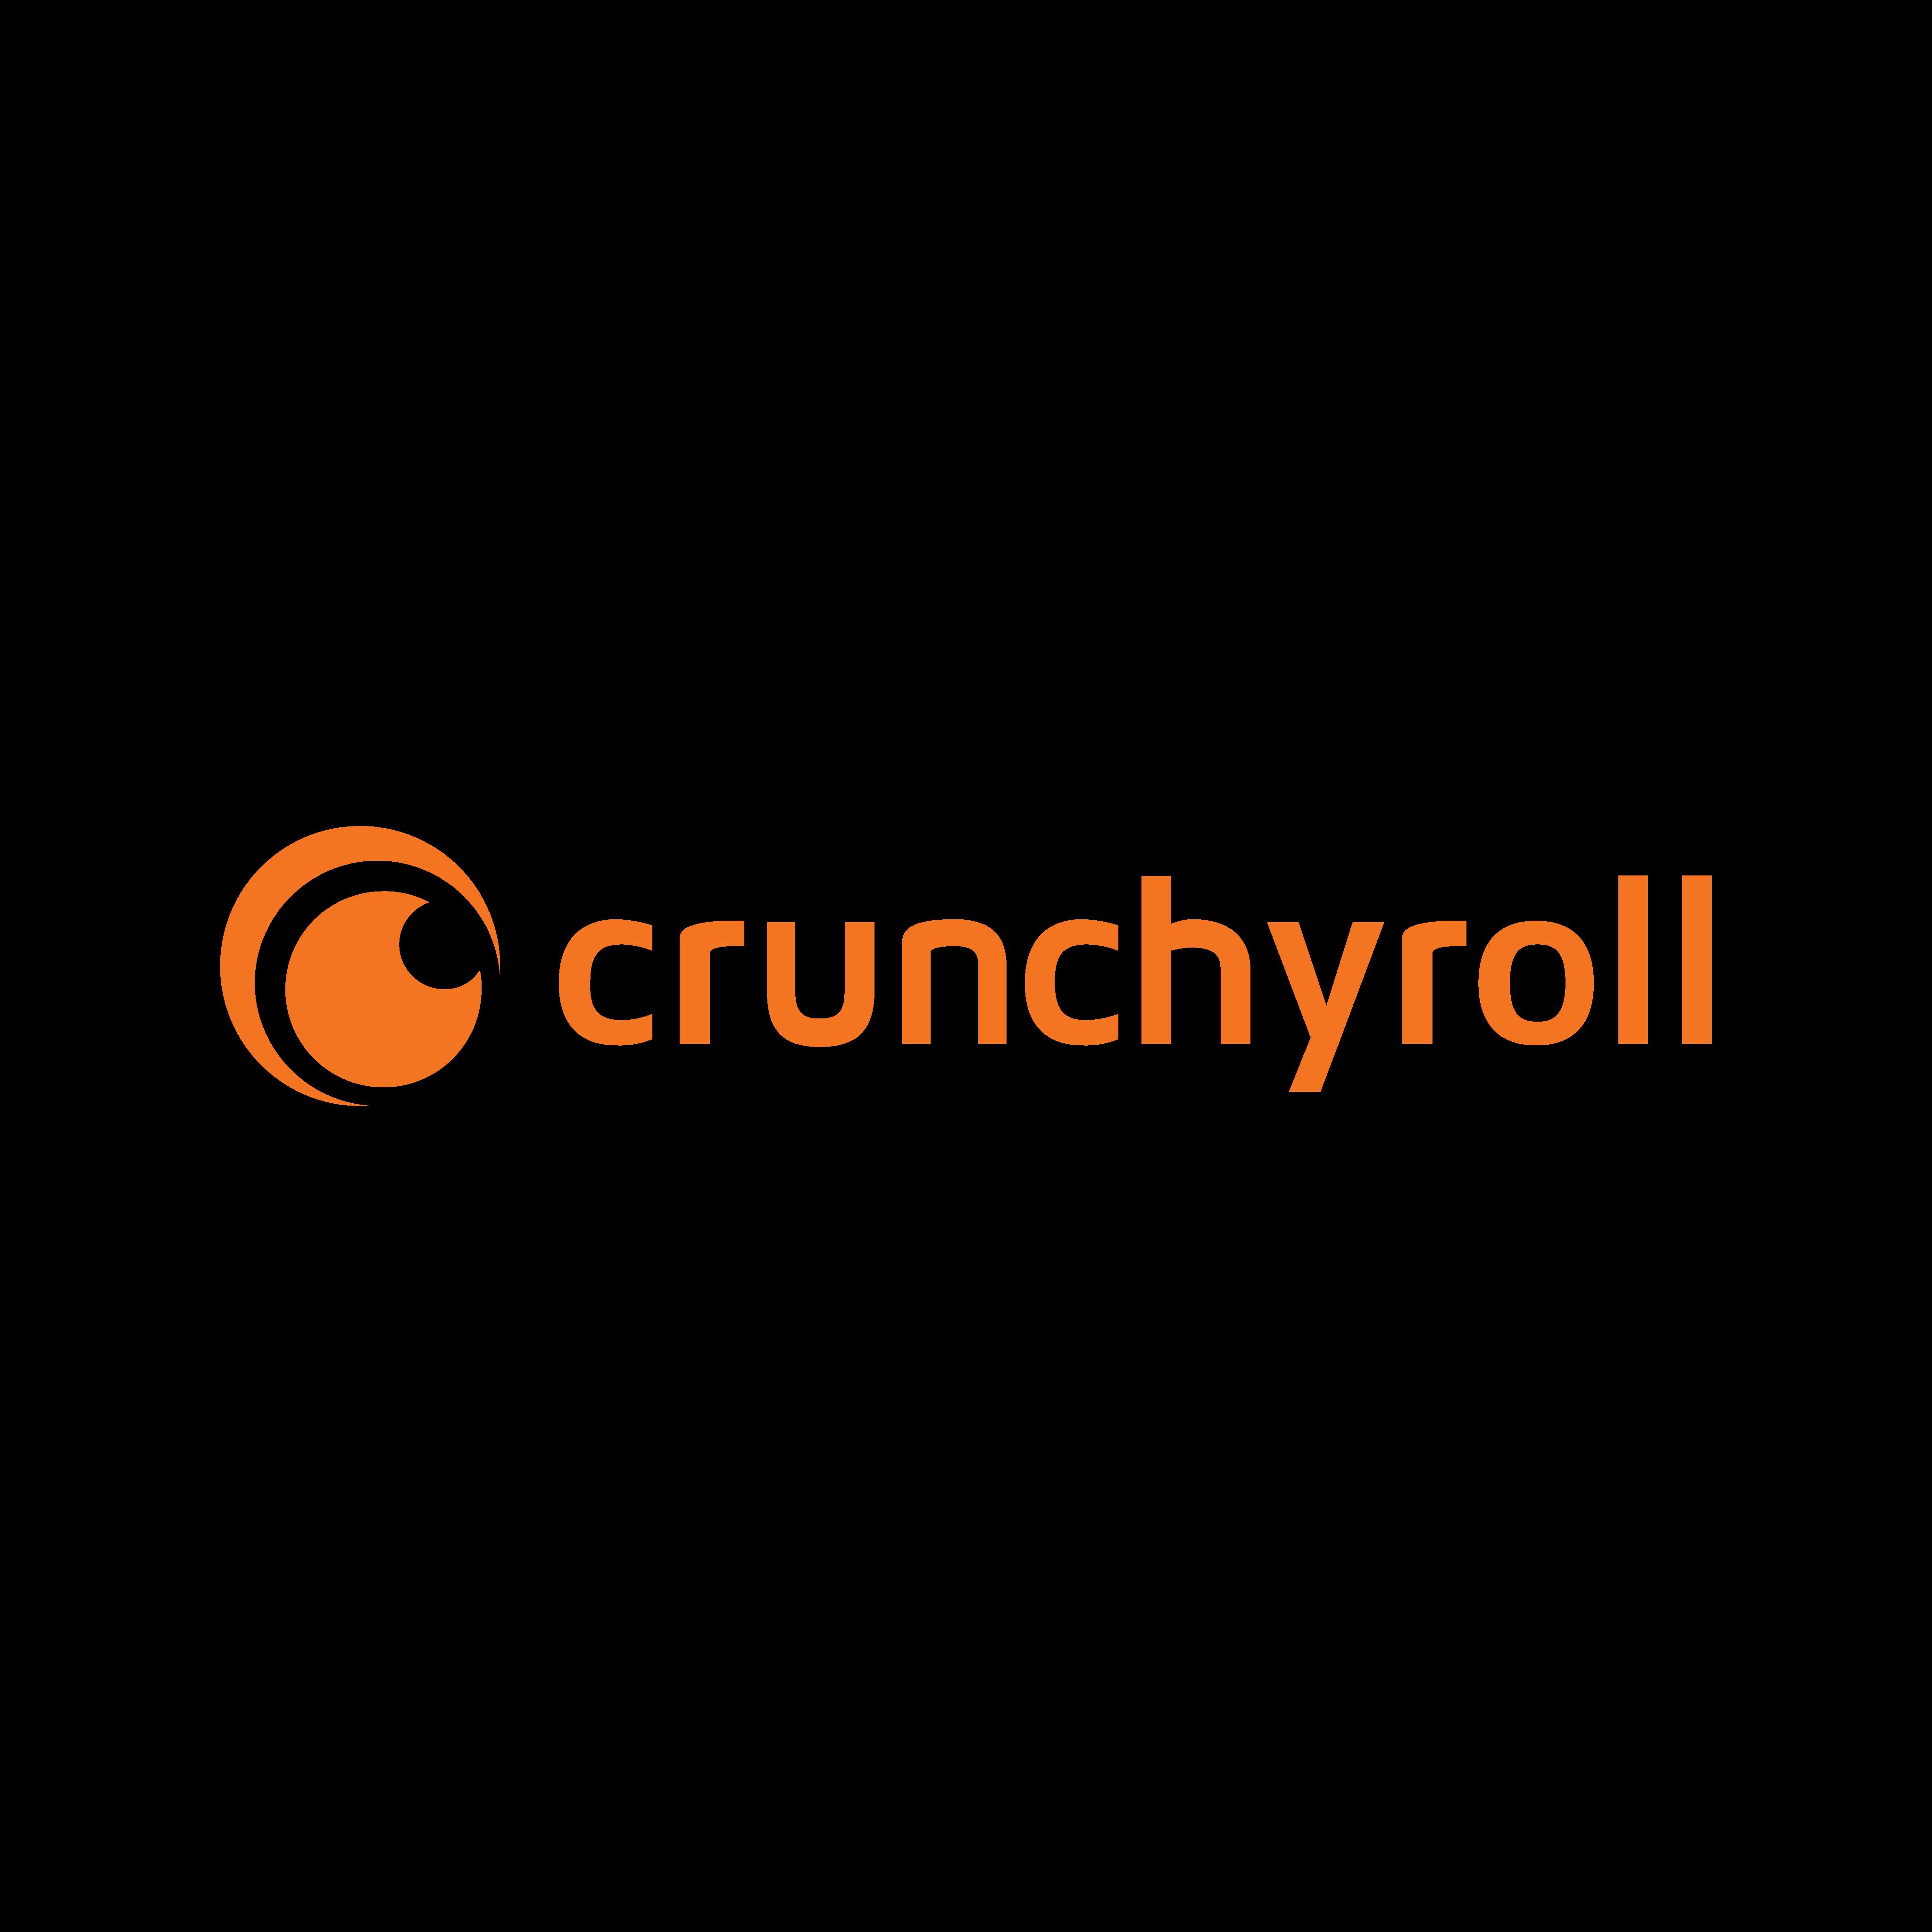 crunchyroll logo 0 - Crunchyroll Logo